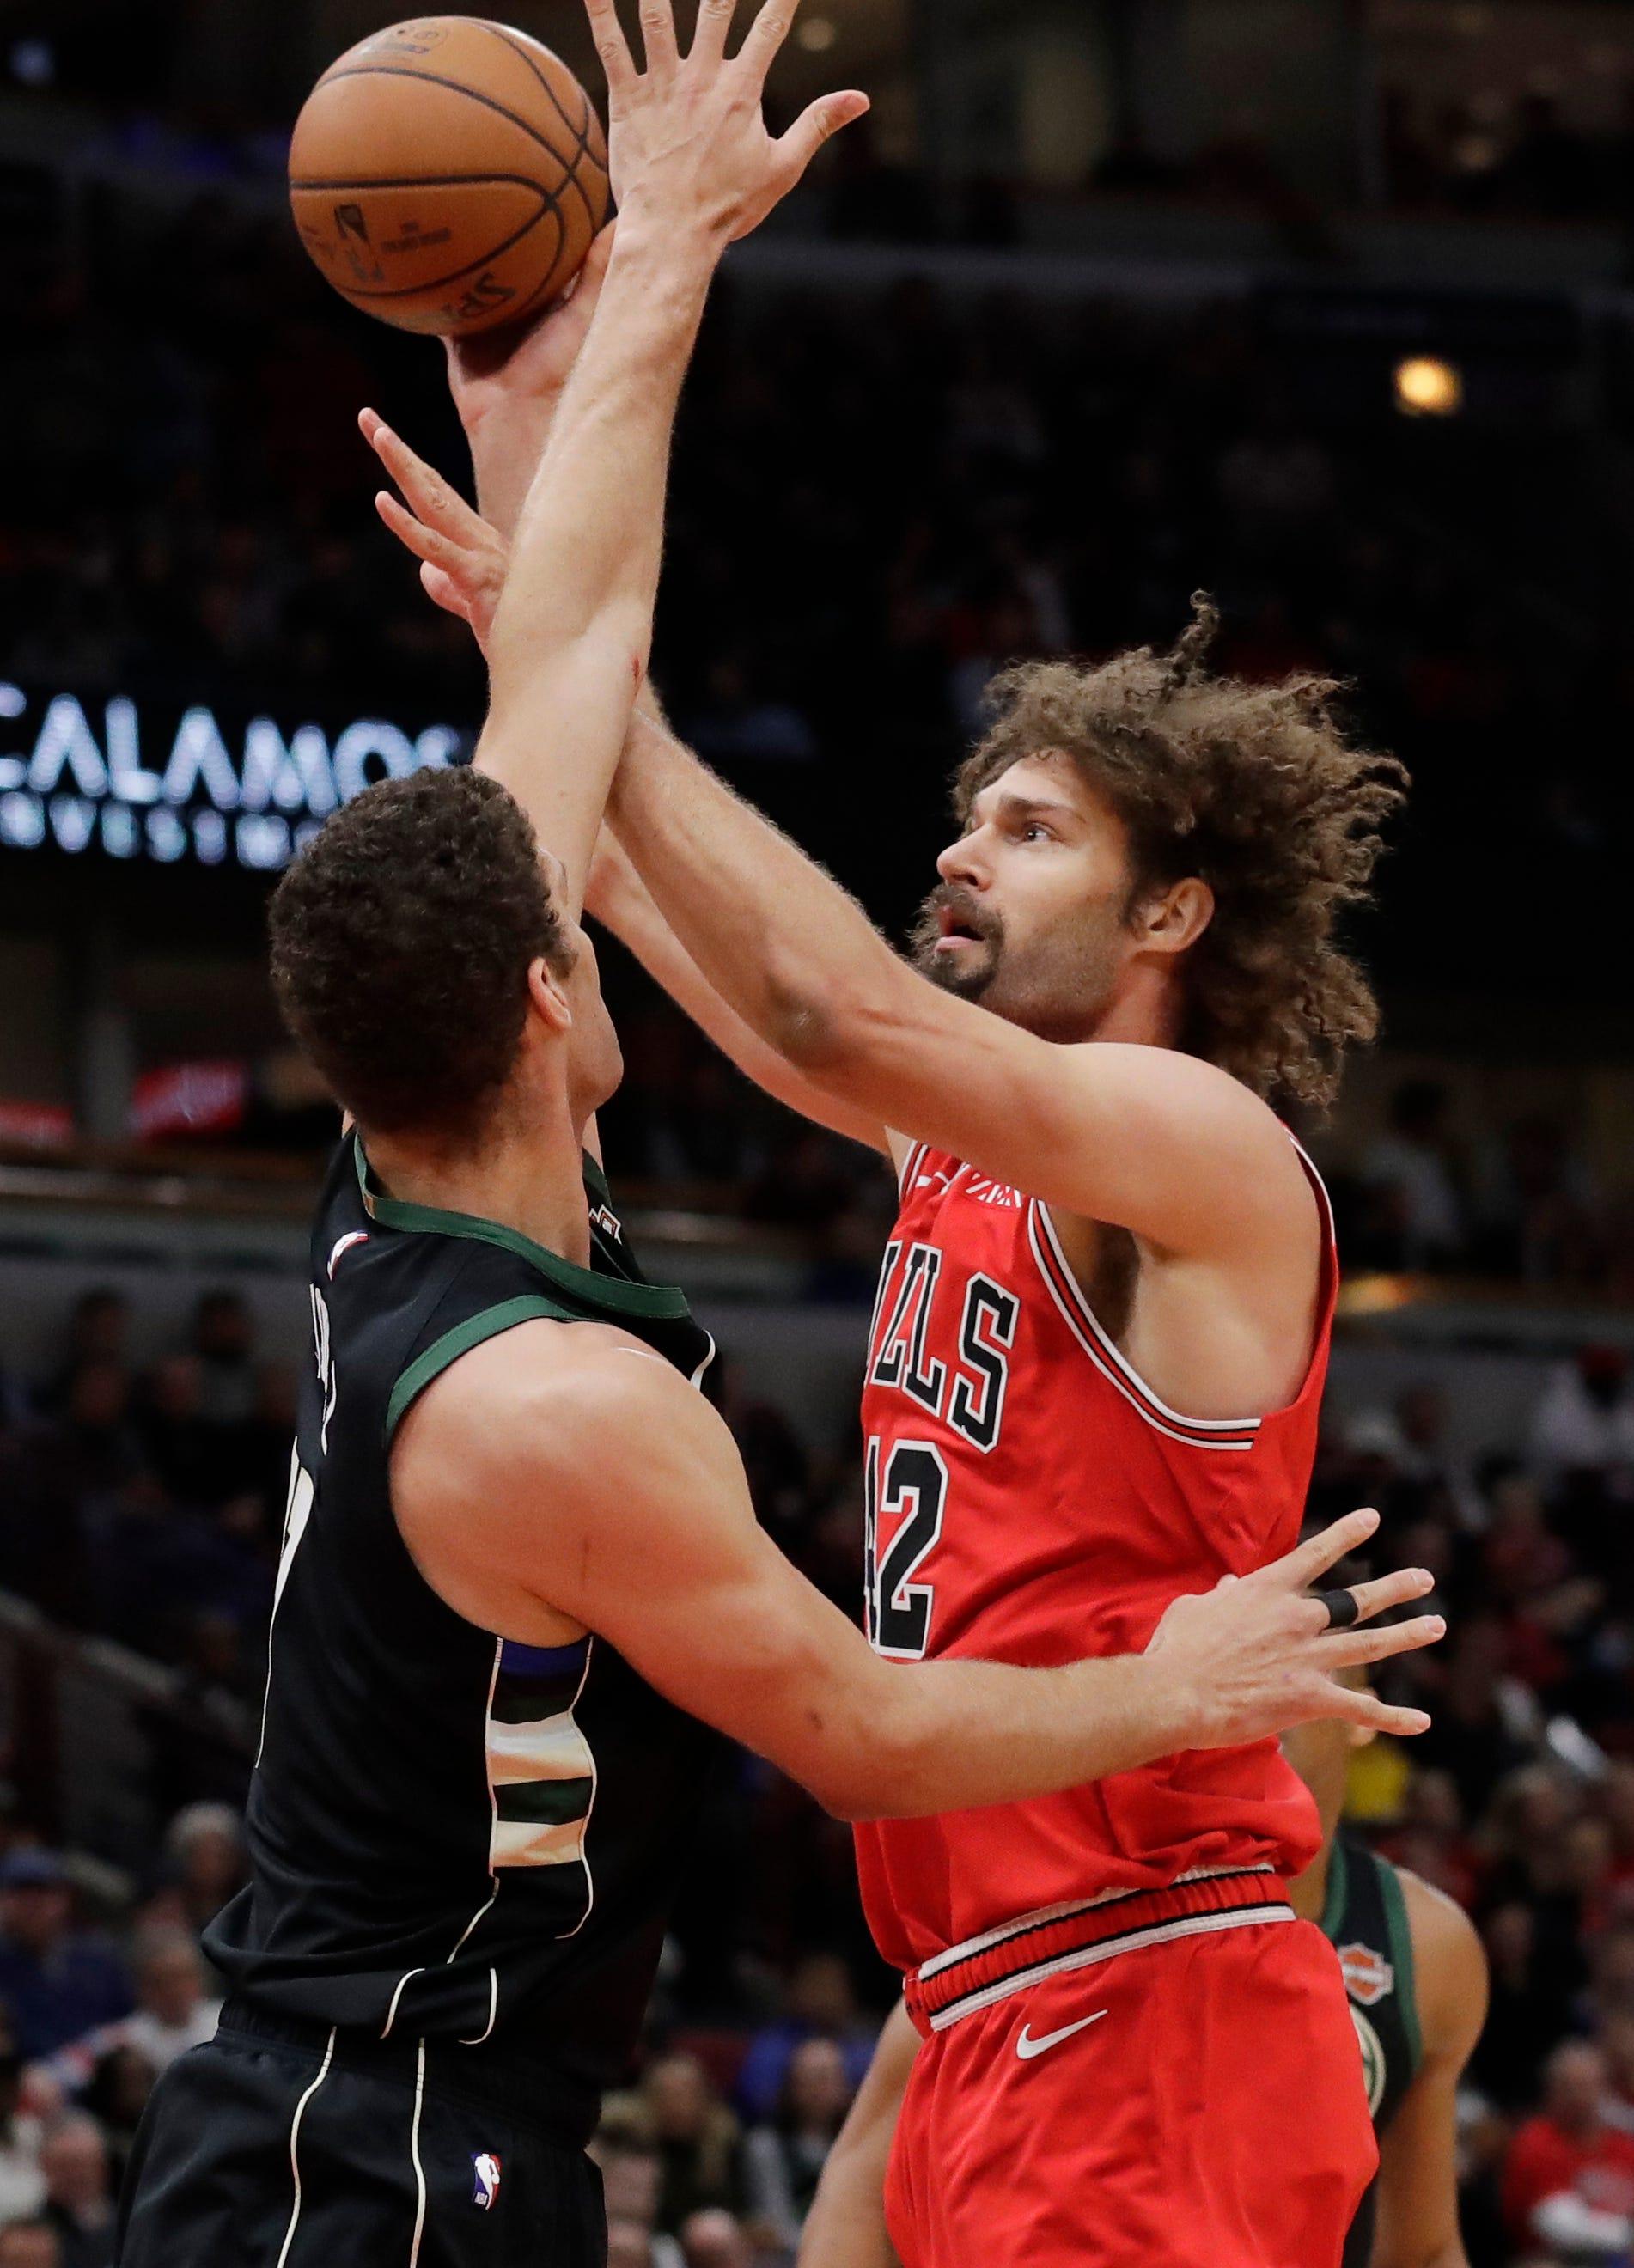 Antetokounmpo helps Bucks outlast Bulls 112-99